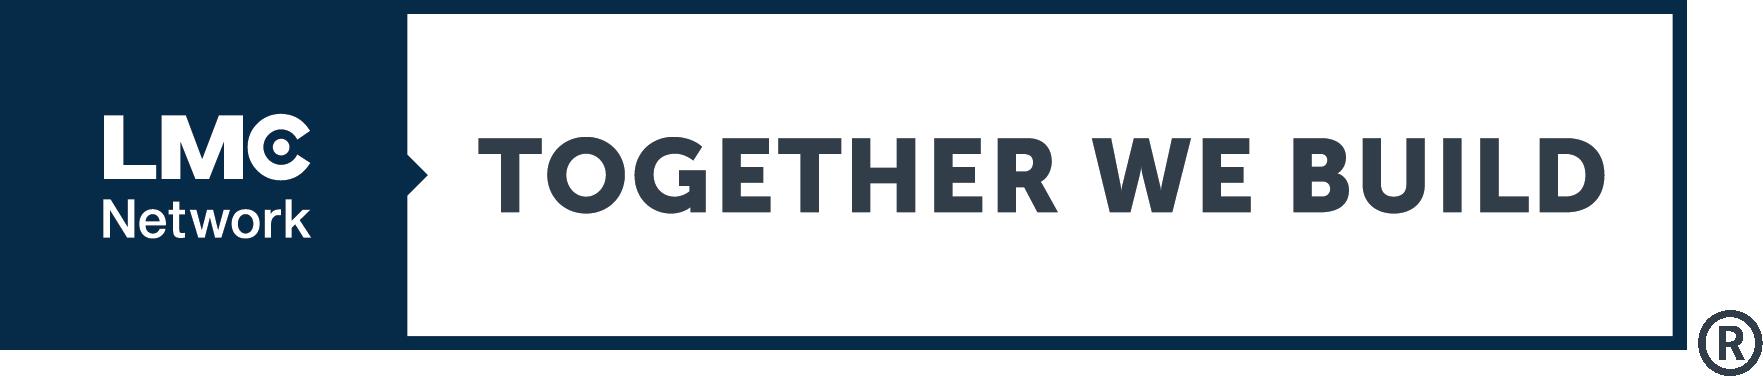 LMC - Together We Build